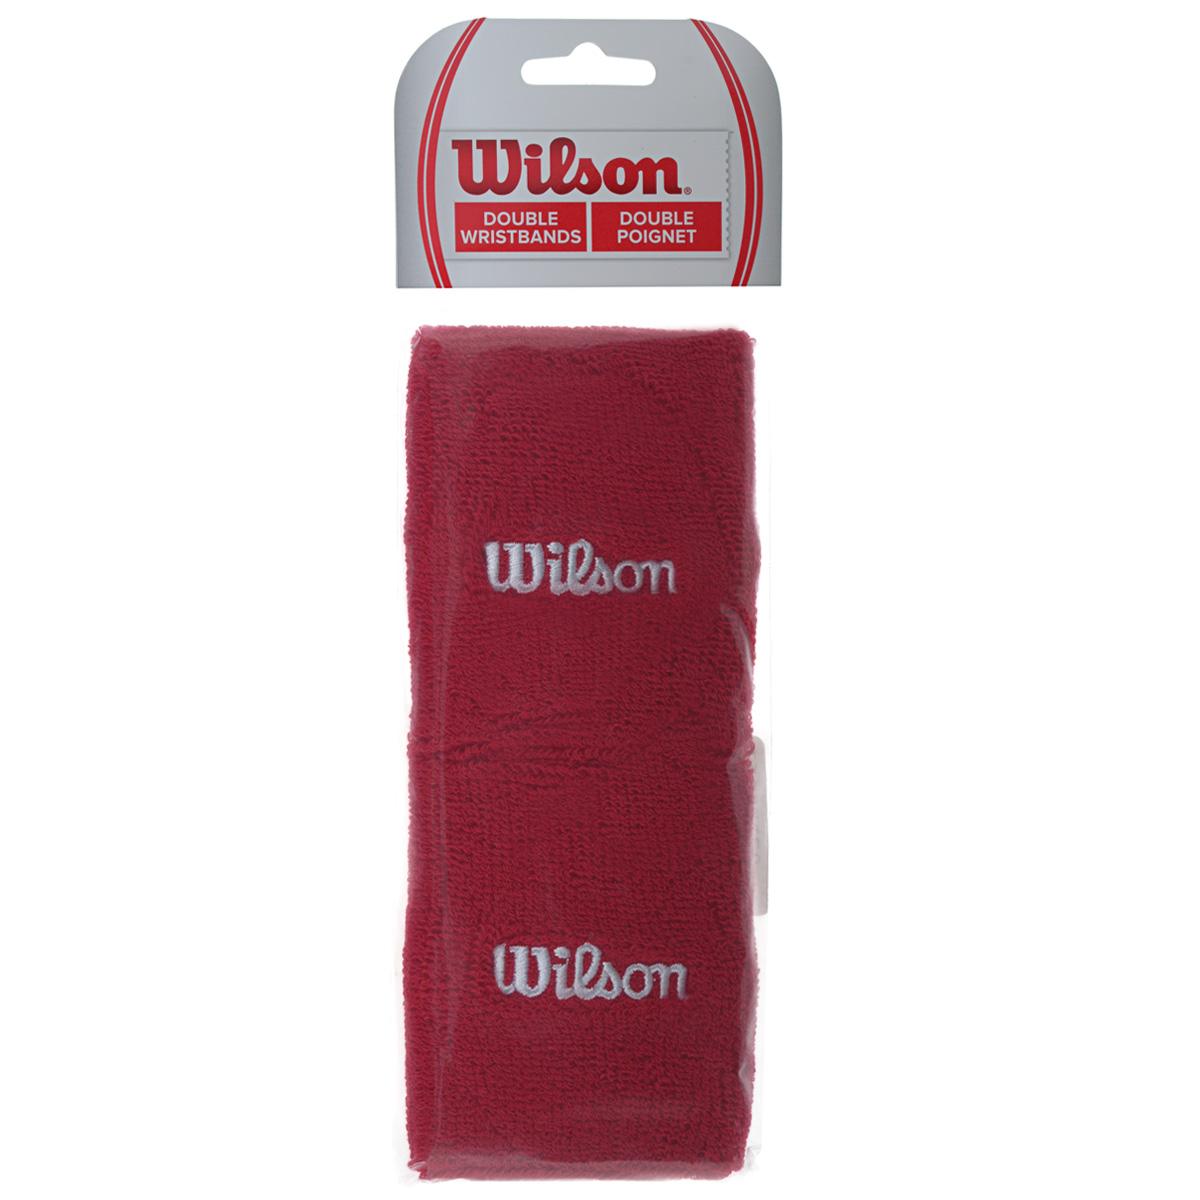 "Wilson Напульсник Wilson ""Double Wristband"", цвет: красный, 2 шт. Размер универсальный"